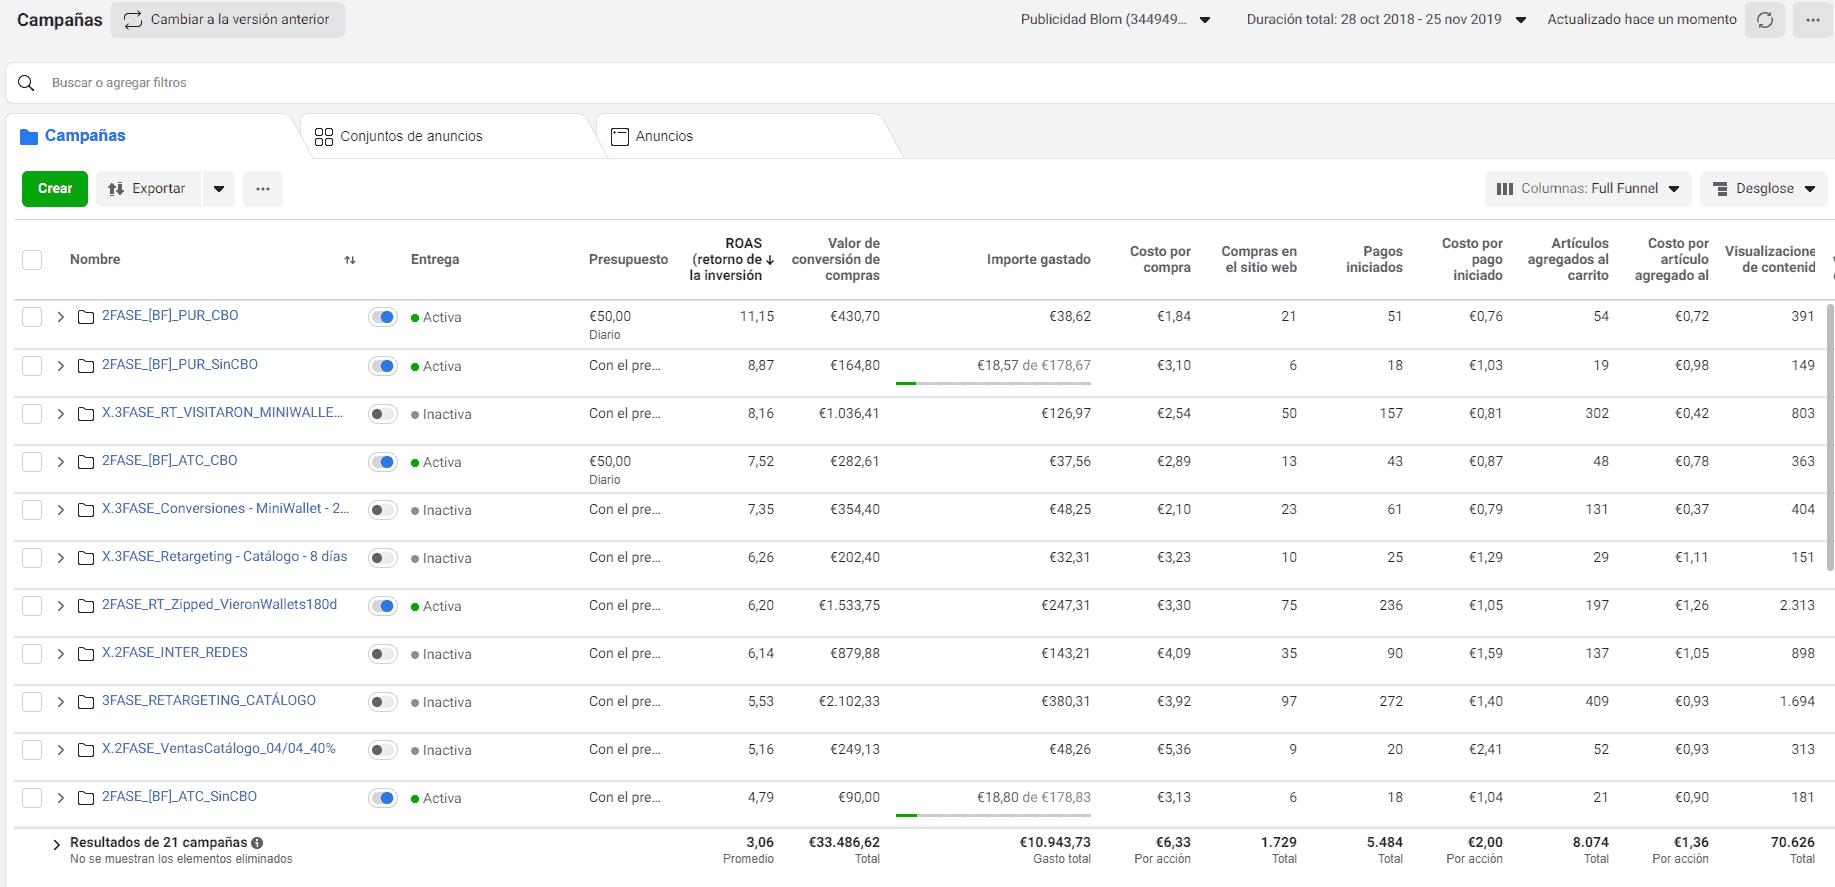 AlexIzquierdo.com: pruebas de resultados